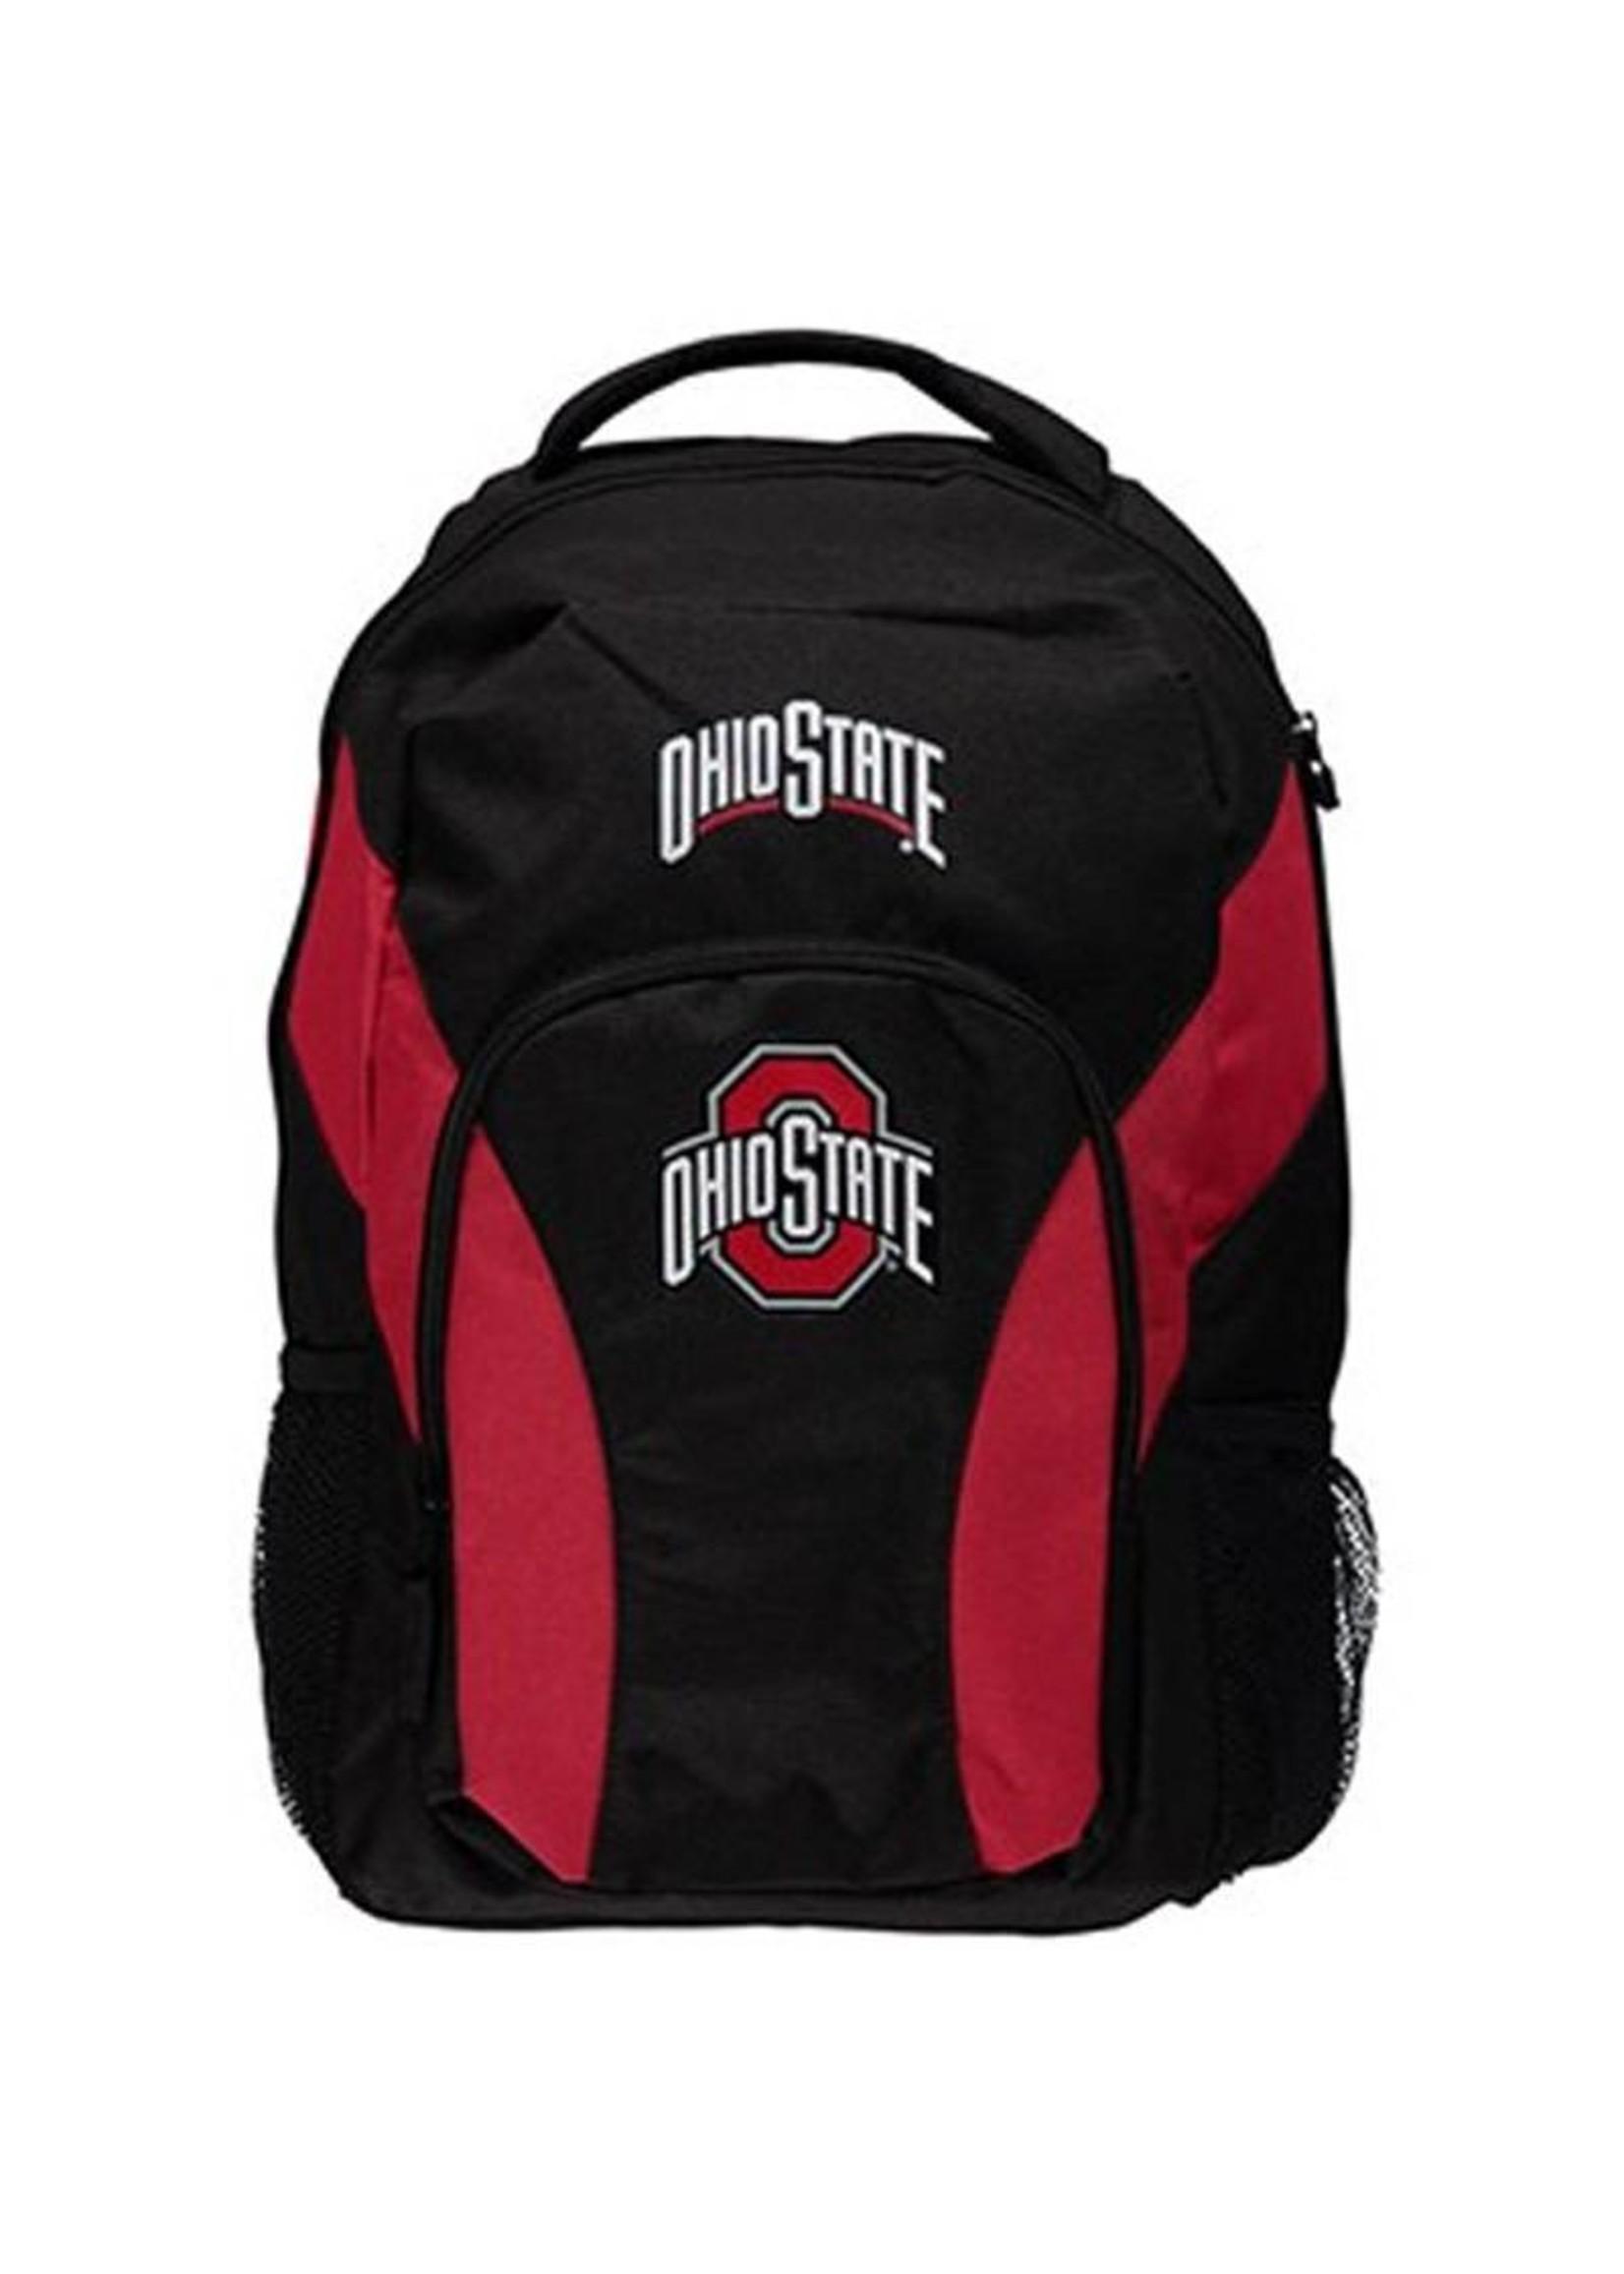 Ohio State University Draft Day Backpack